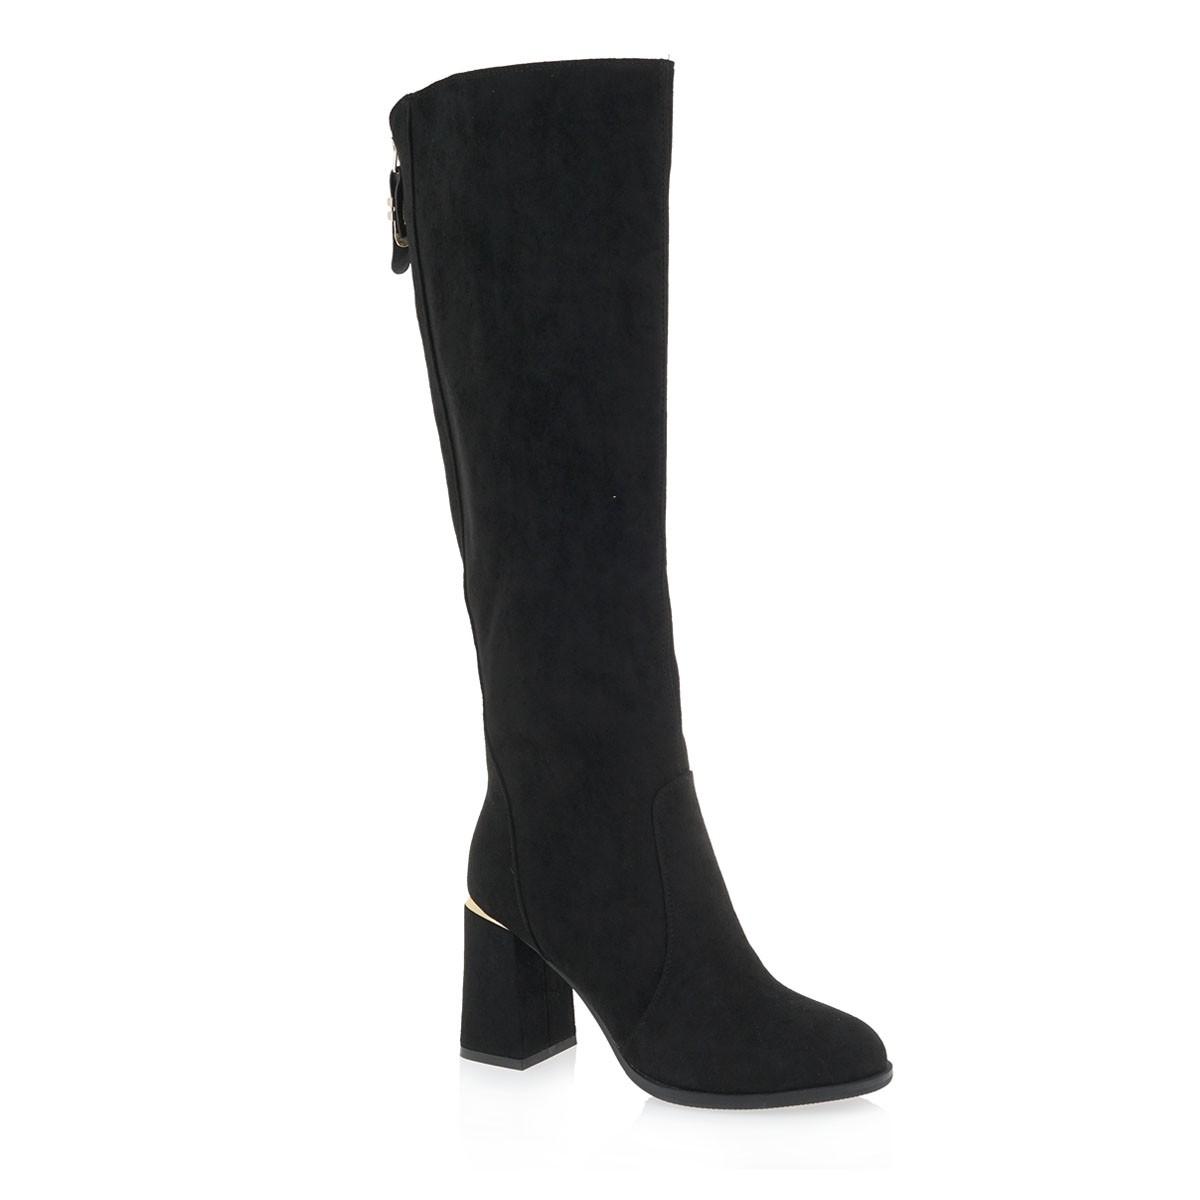 Exe Shoes Γυναικεία Παπούτσια Μπότα 426-XJ1130 Μαύρo Καστόρι J267V4265004